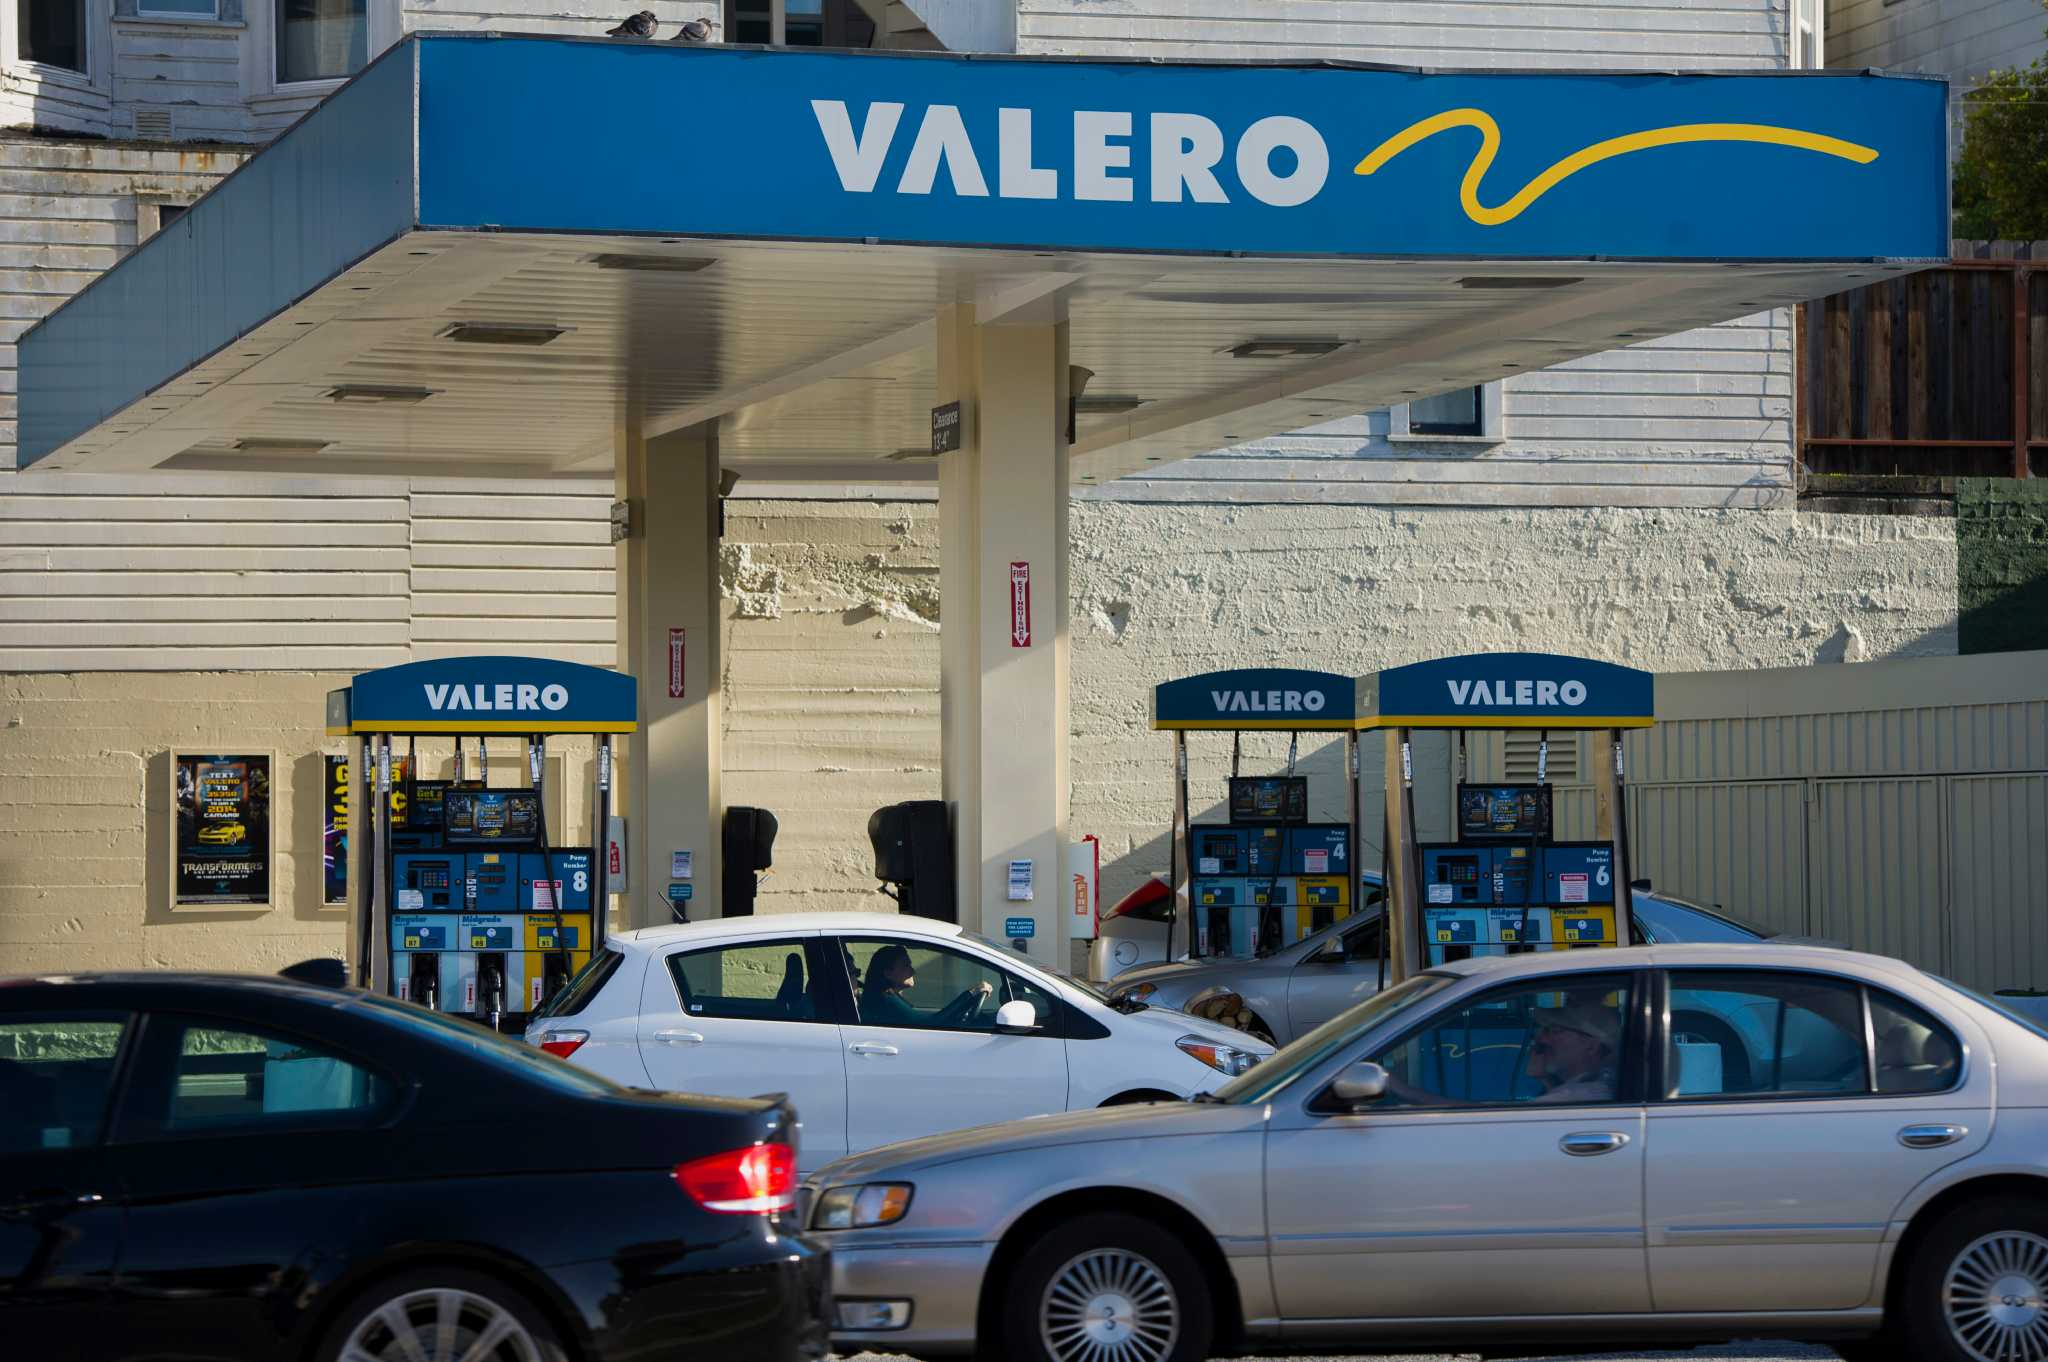 Valero fuel rebates planned expressnews colourmoves